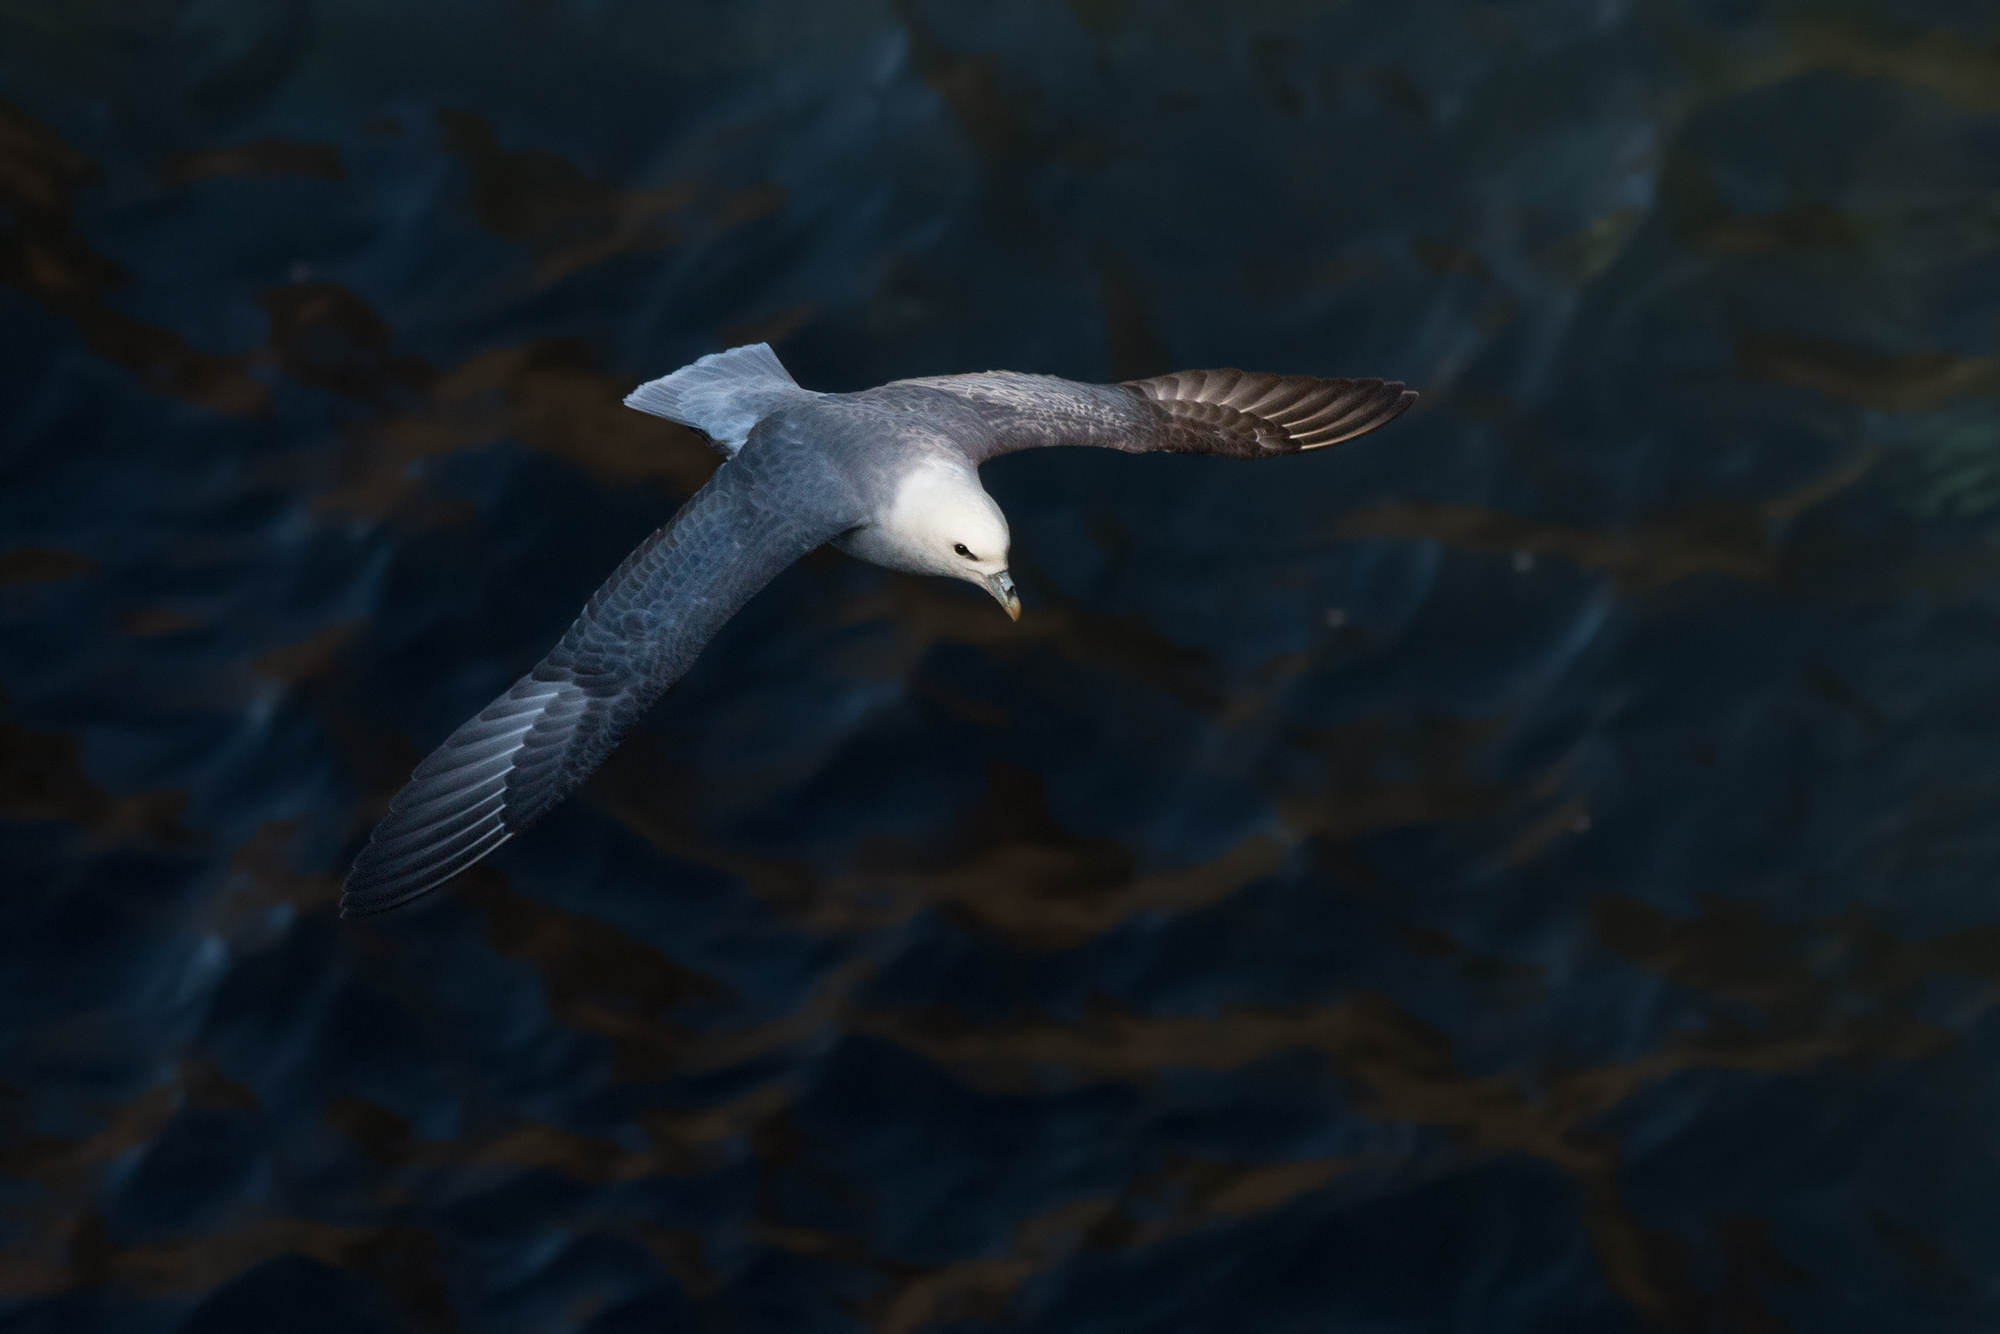 Stormfågel-JPEG_web 19.jpg